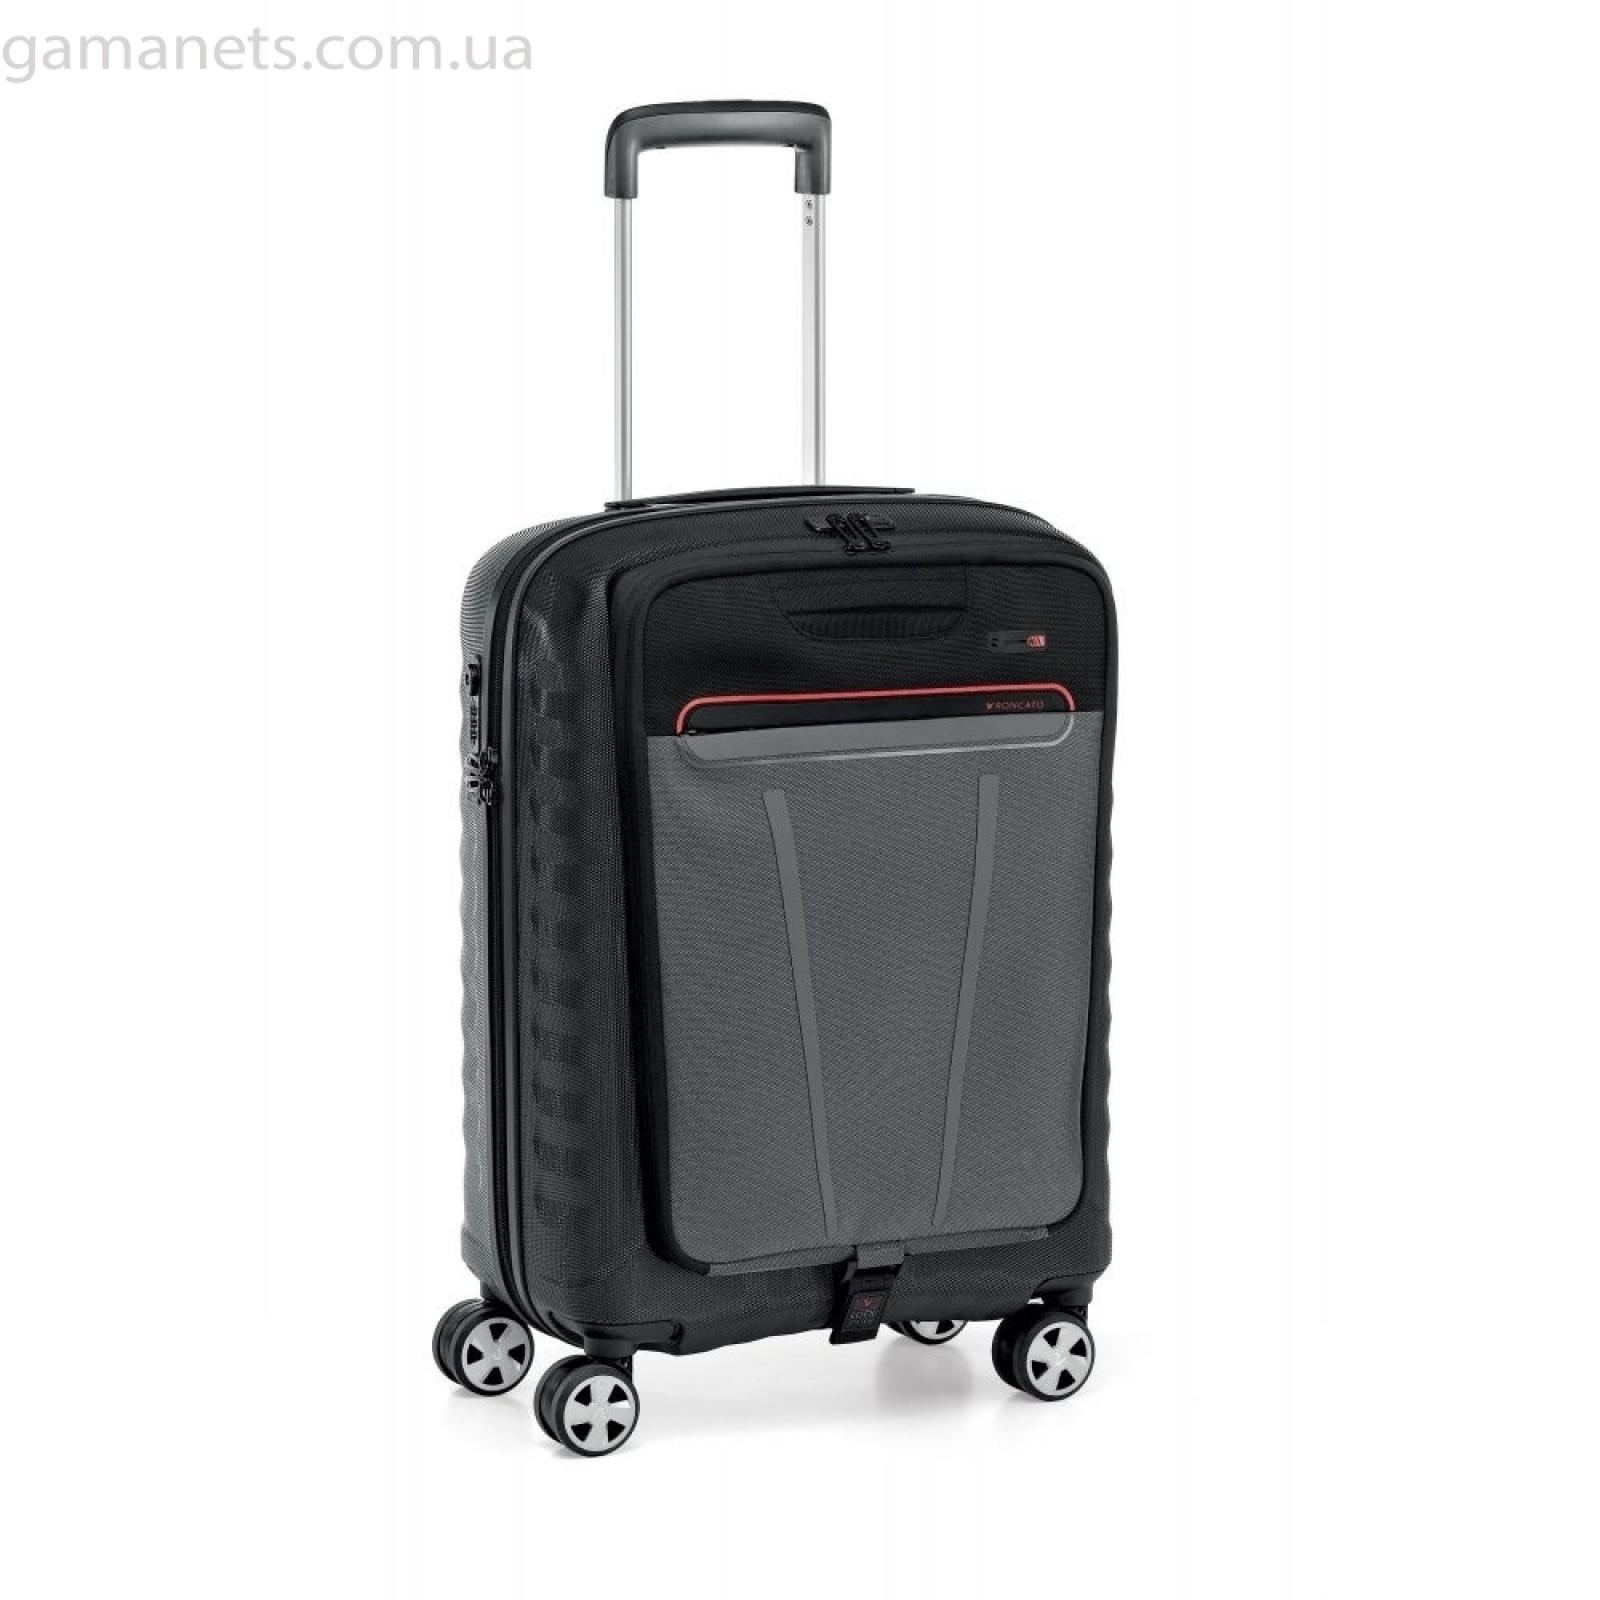 Cabin Case Business Double Spinner 55 cm-RS/NE-UN